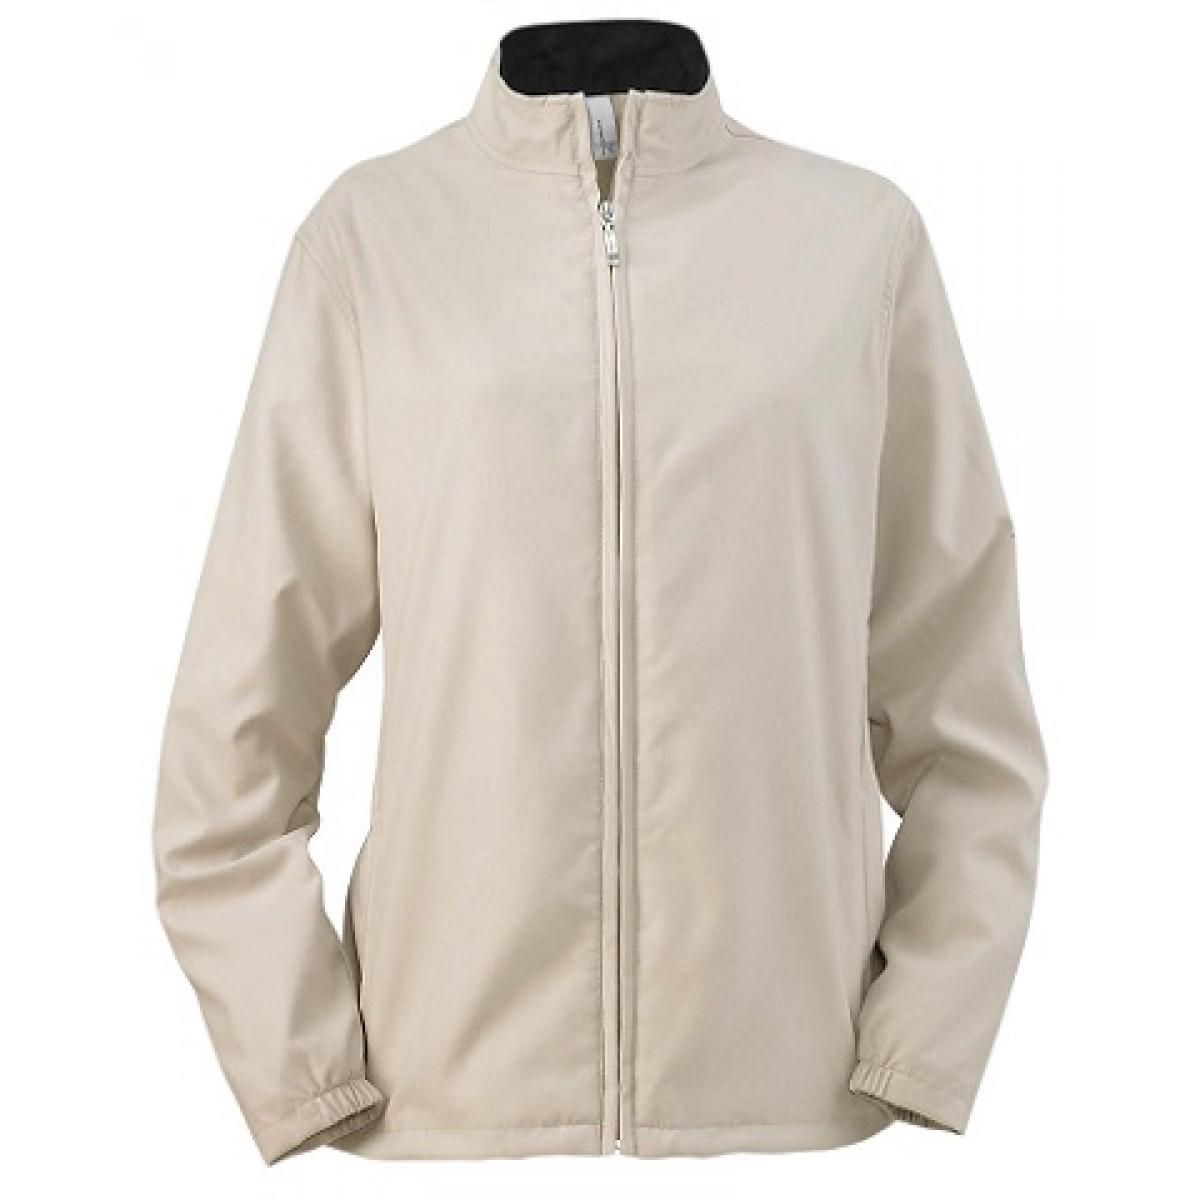 Ladies' Full-Zip Lined Wind Jacket-L